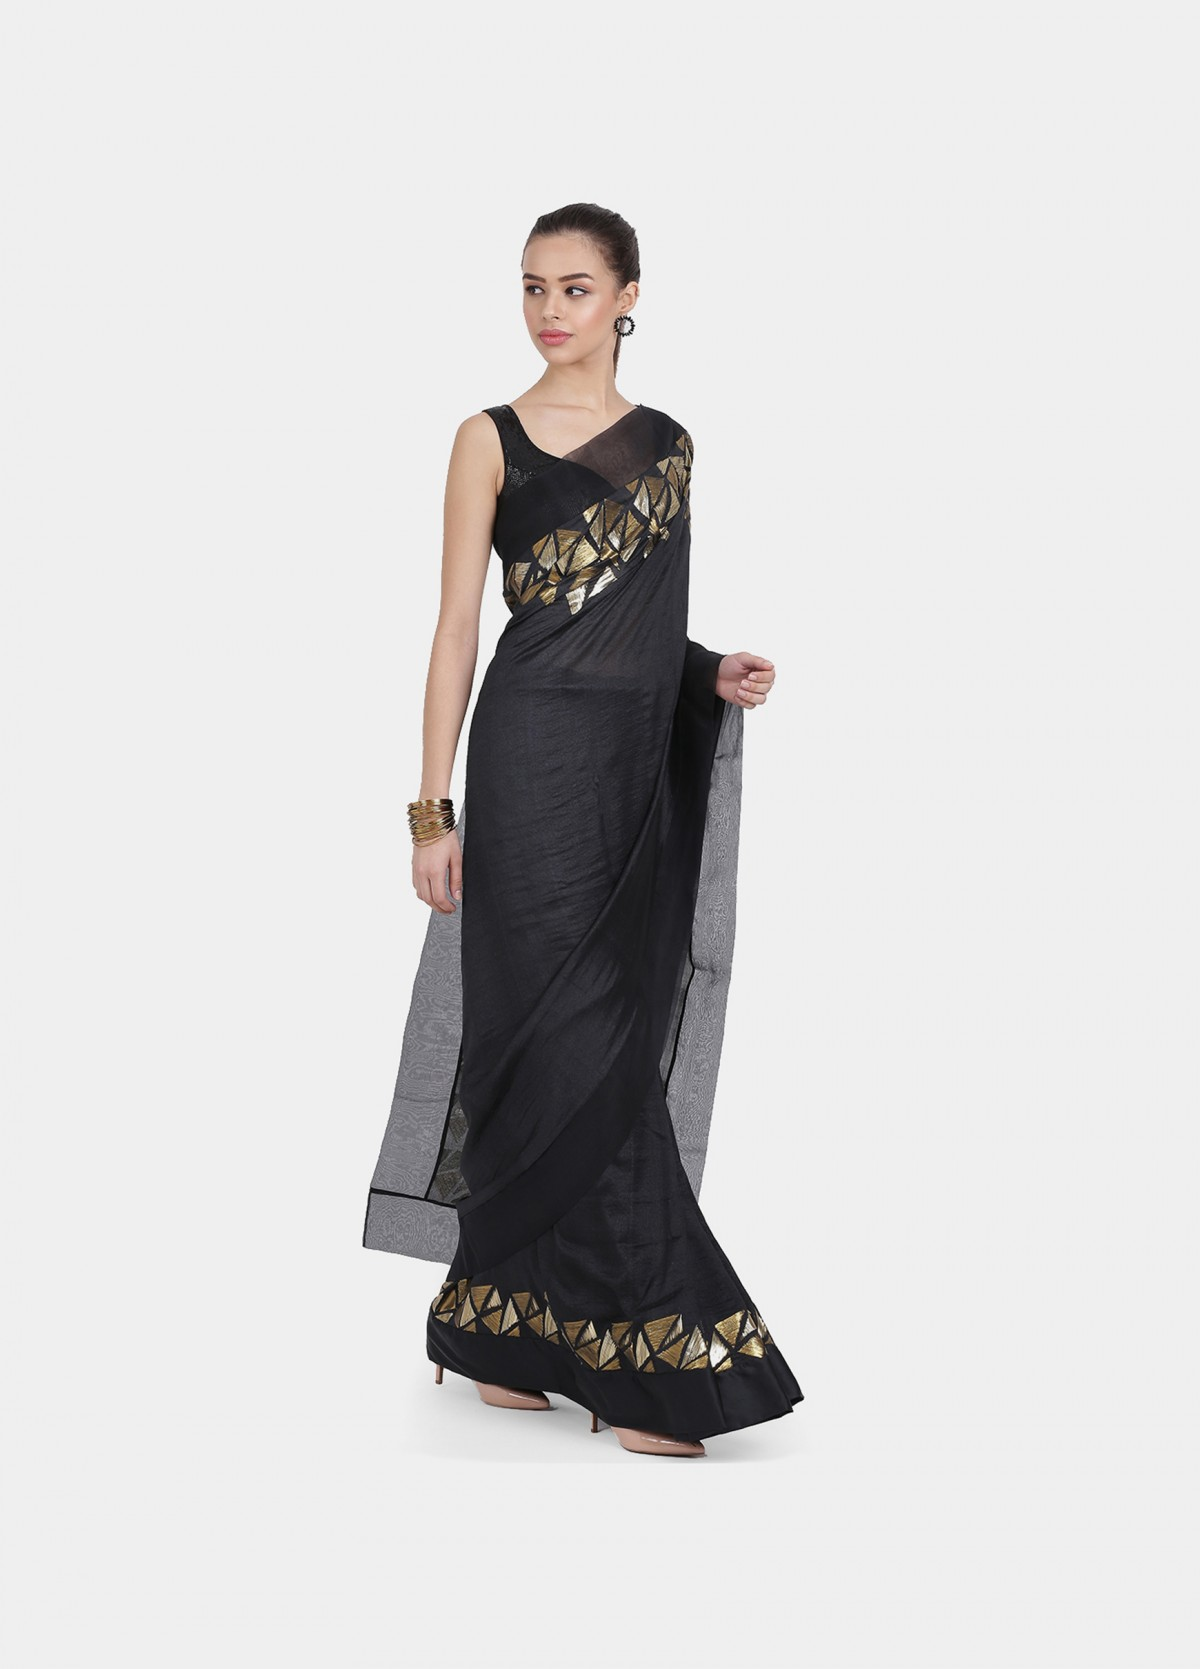 The Strokes Sari